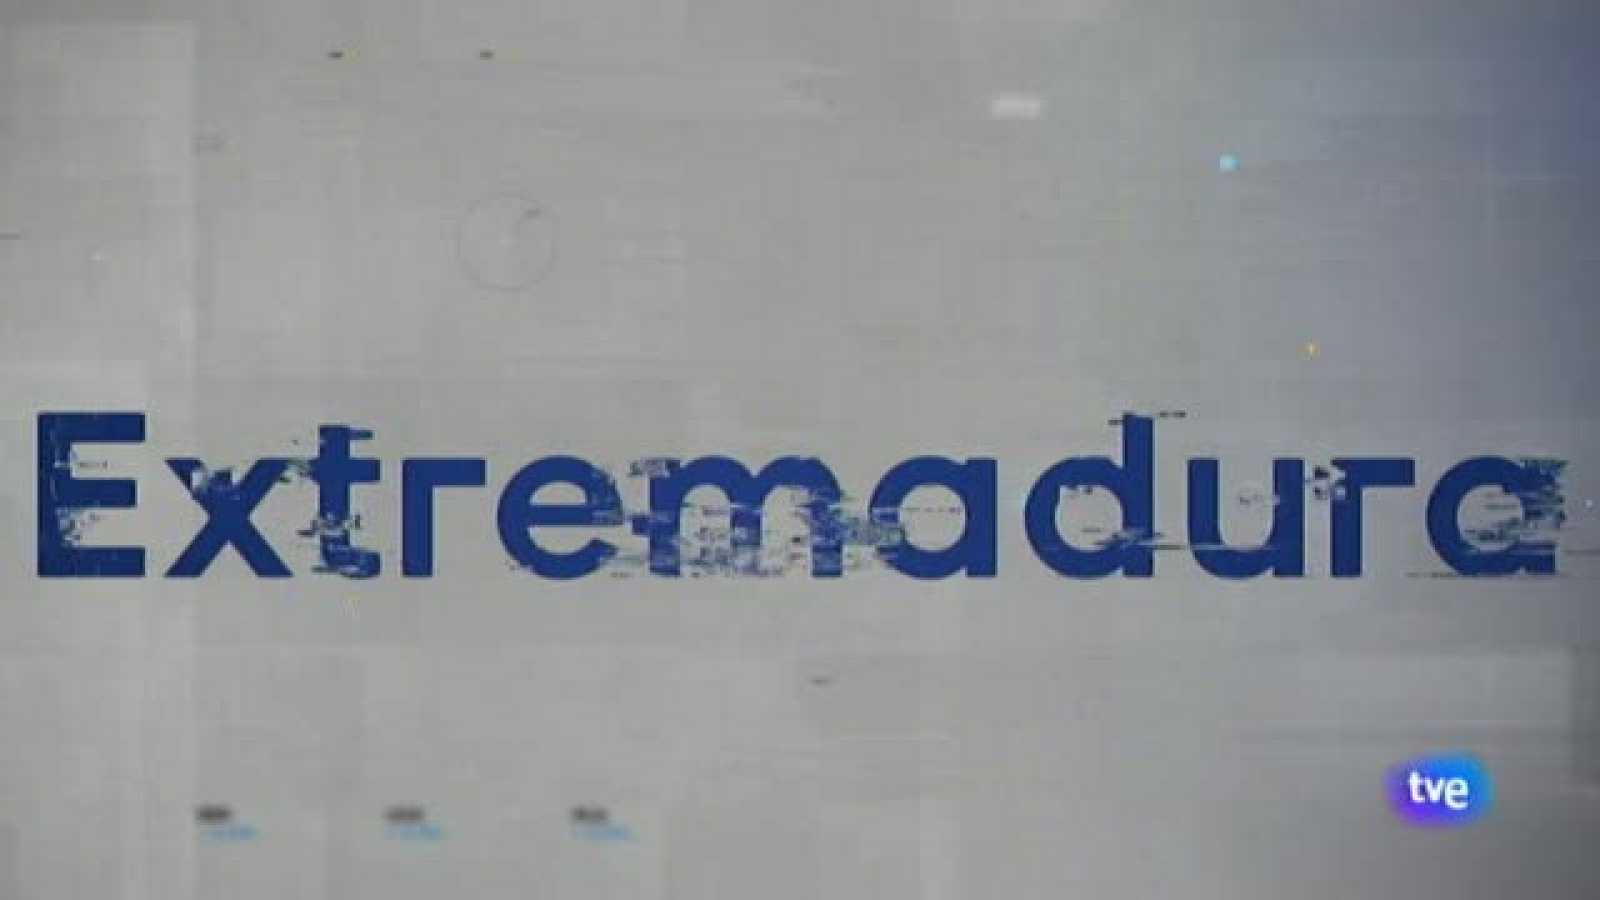 Noticias de Extremadura 2 - 08/04/2021